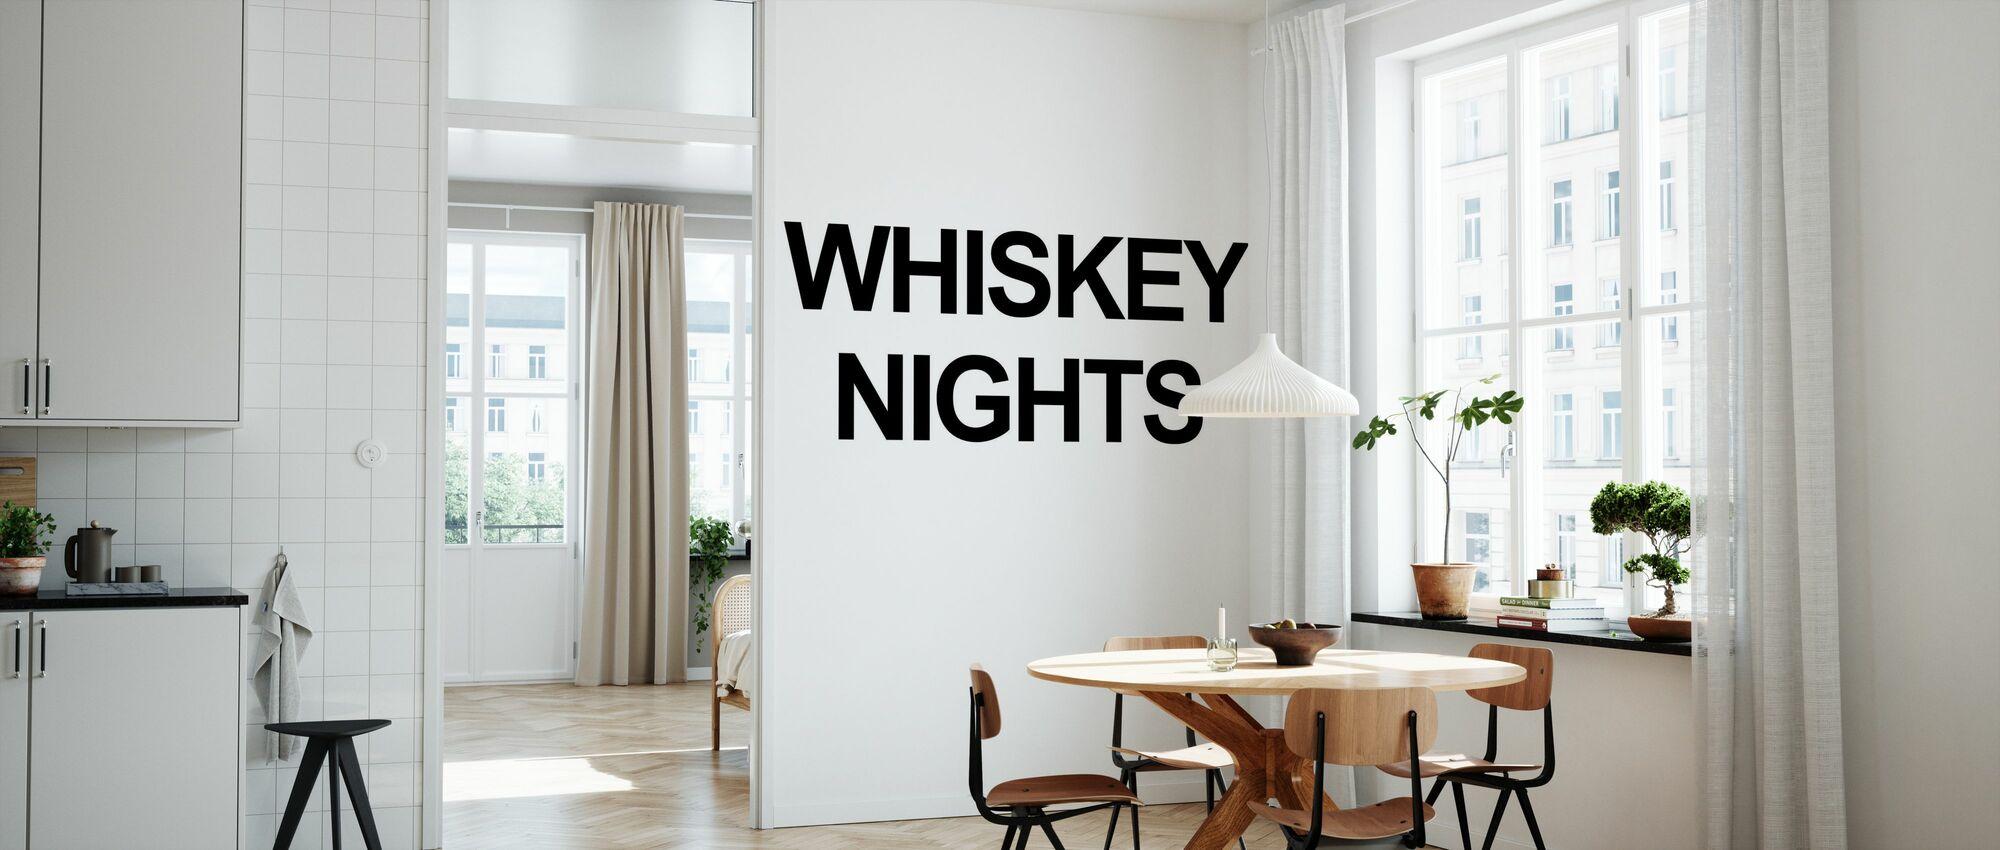 Whiskey Nights Betaalbaar Fotobehang Photowall